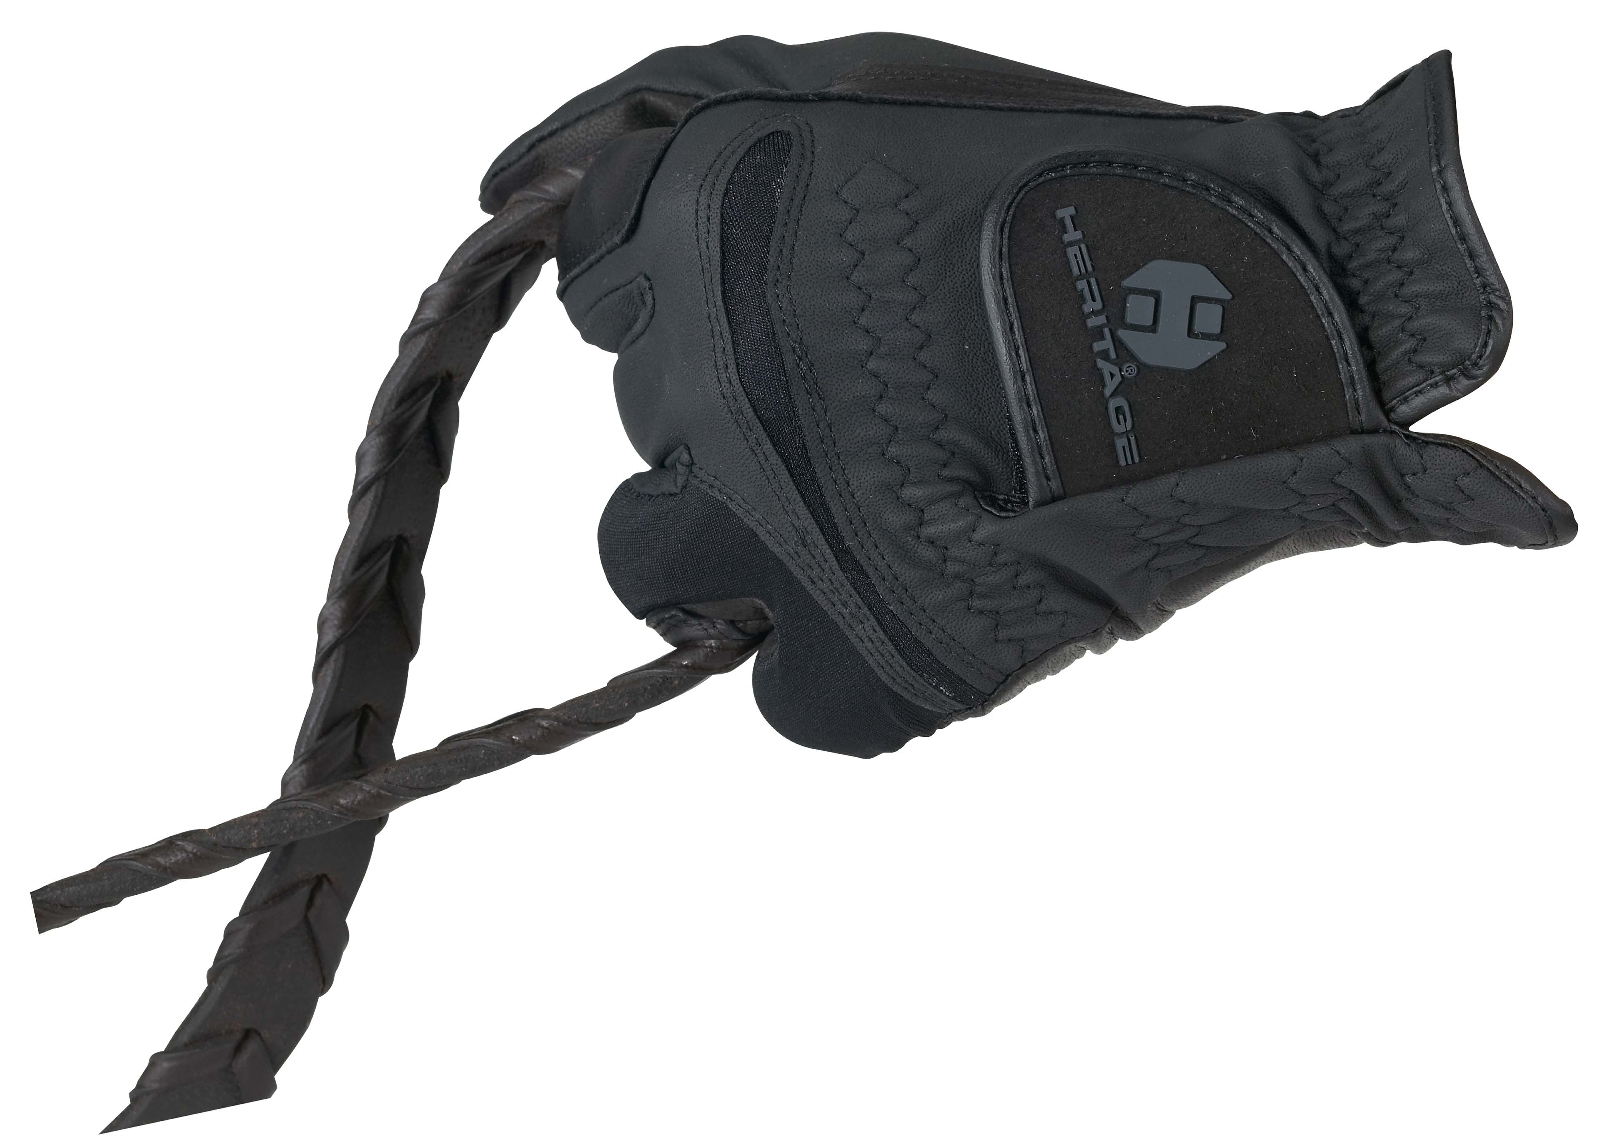 Heritage Pro-Comp Show Glove